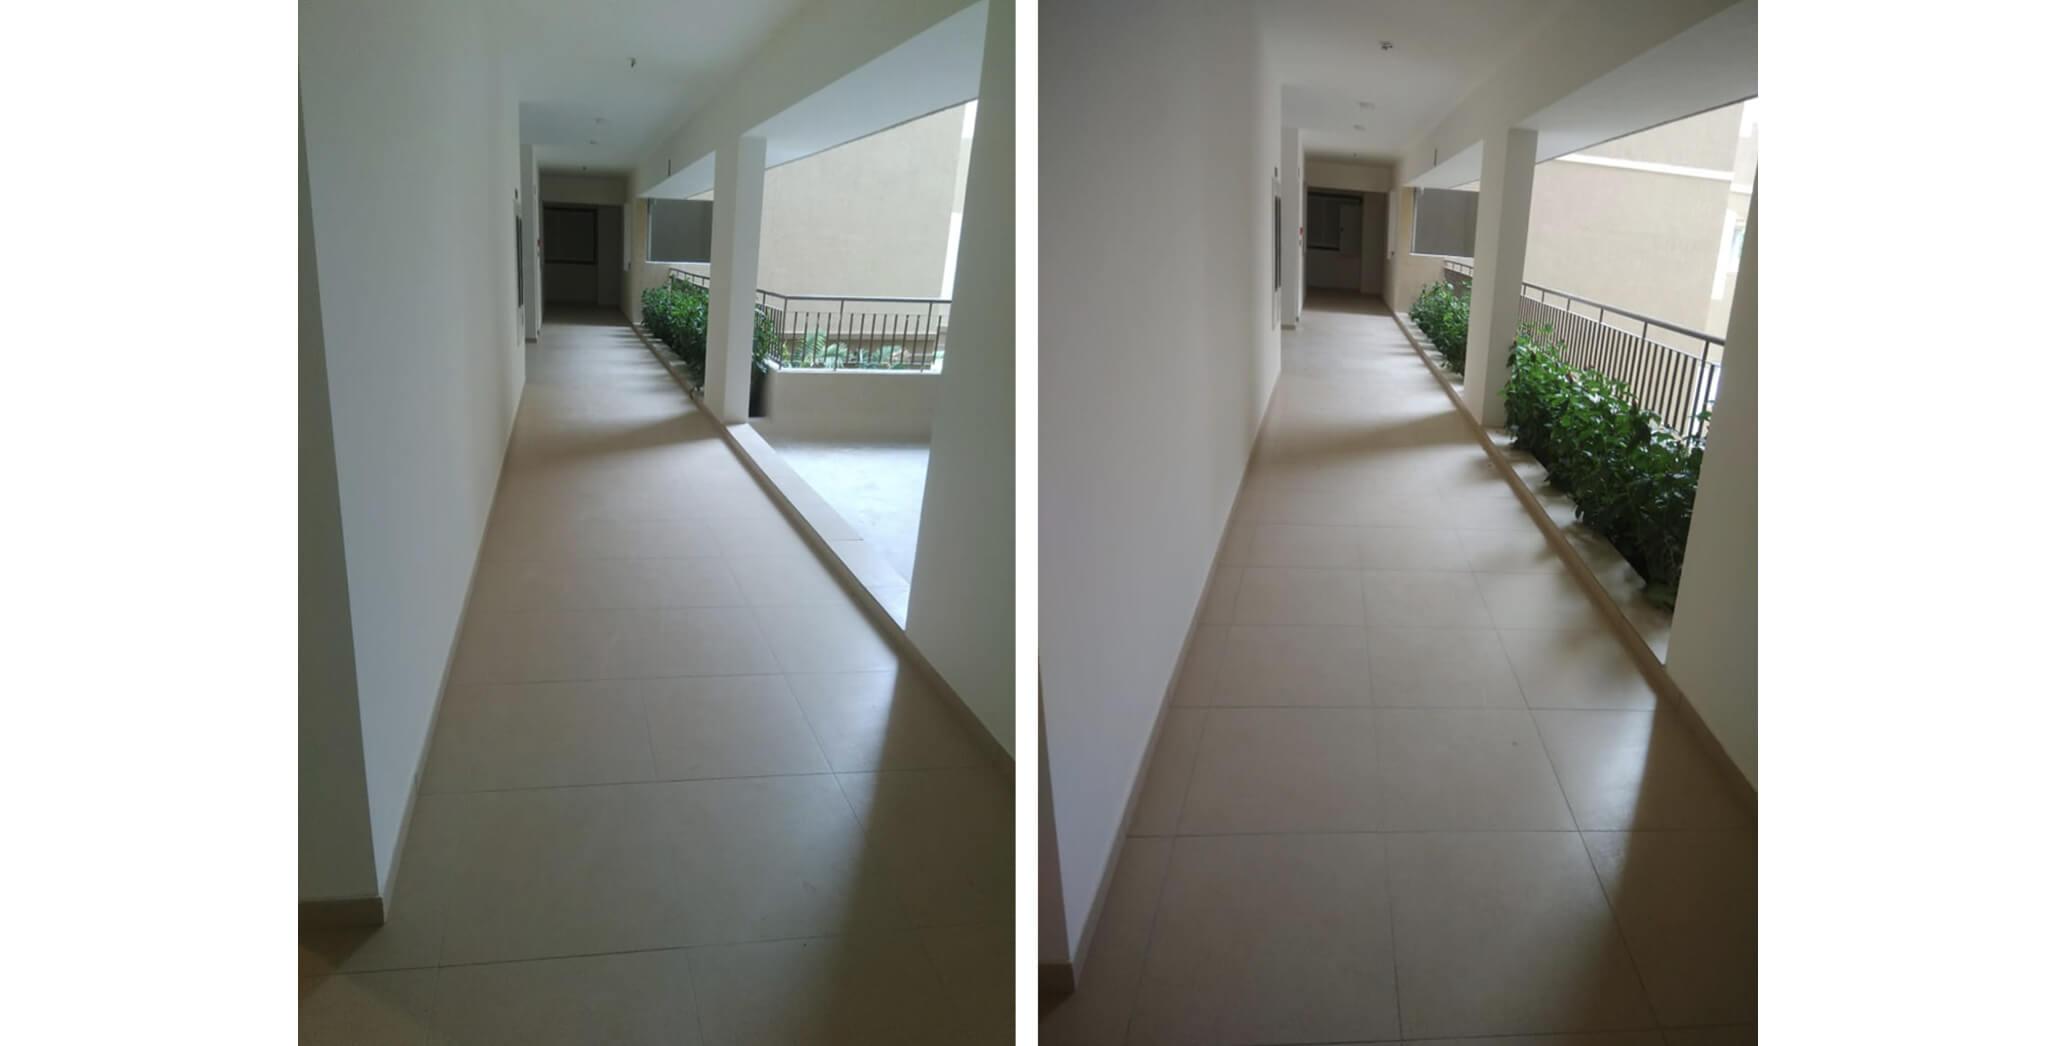 Nov 2019 - Deodar—B block: Corridor–Final coat, painting completed